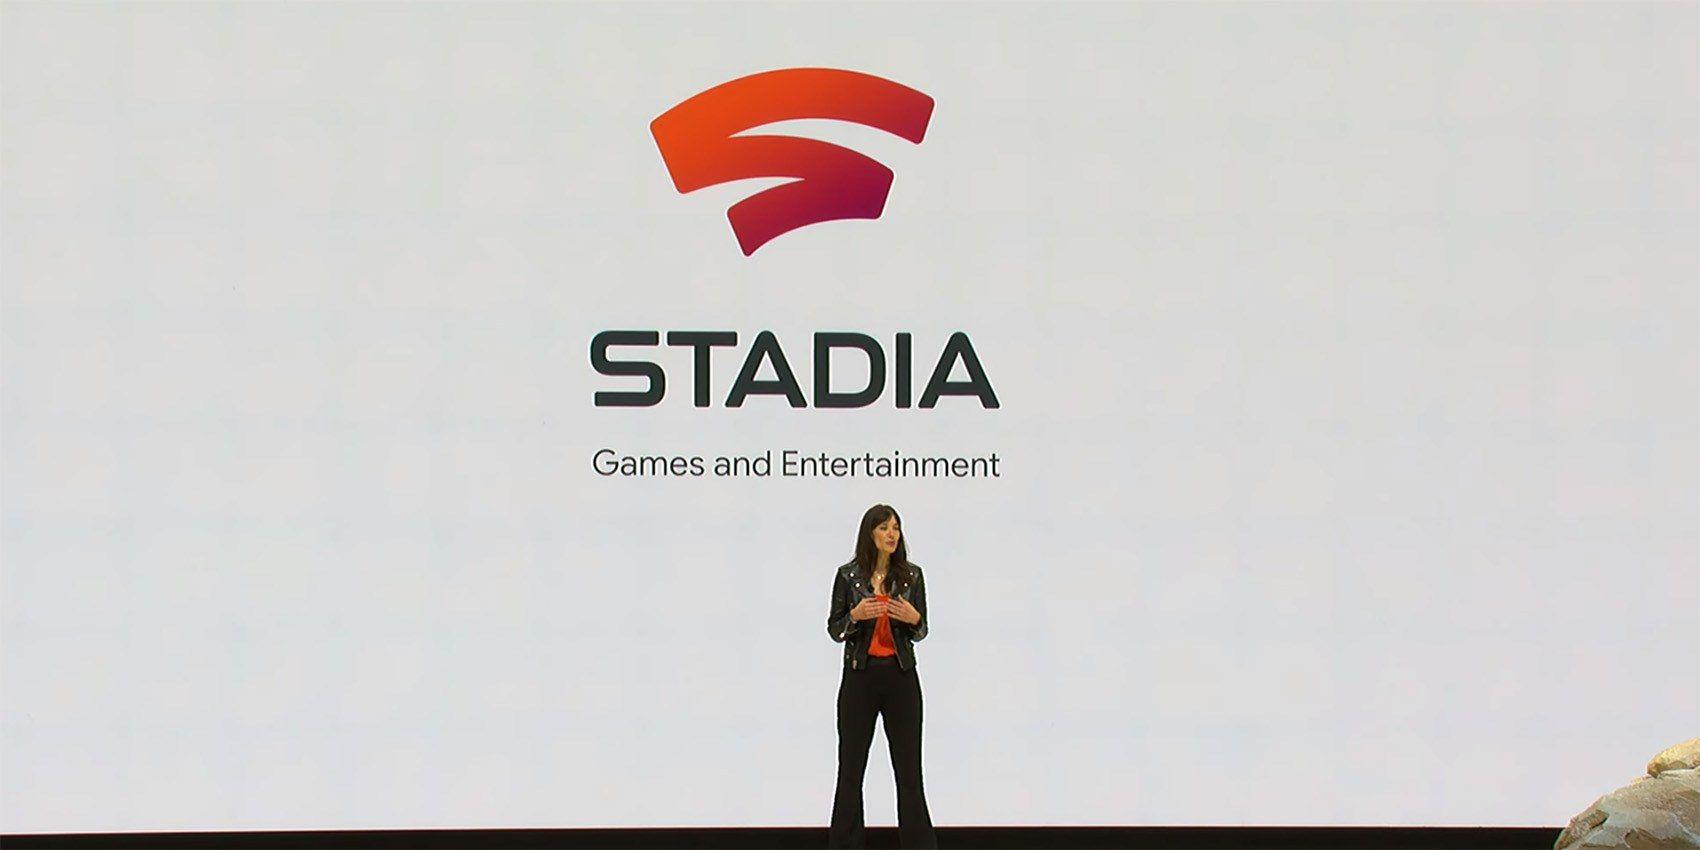 Risultati immagini per stadia games and entertainment